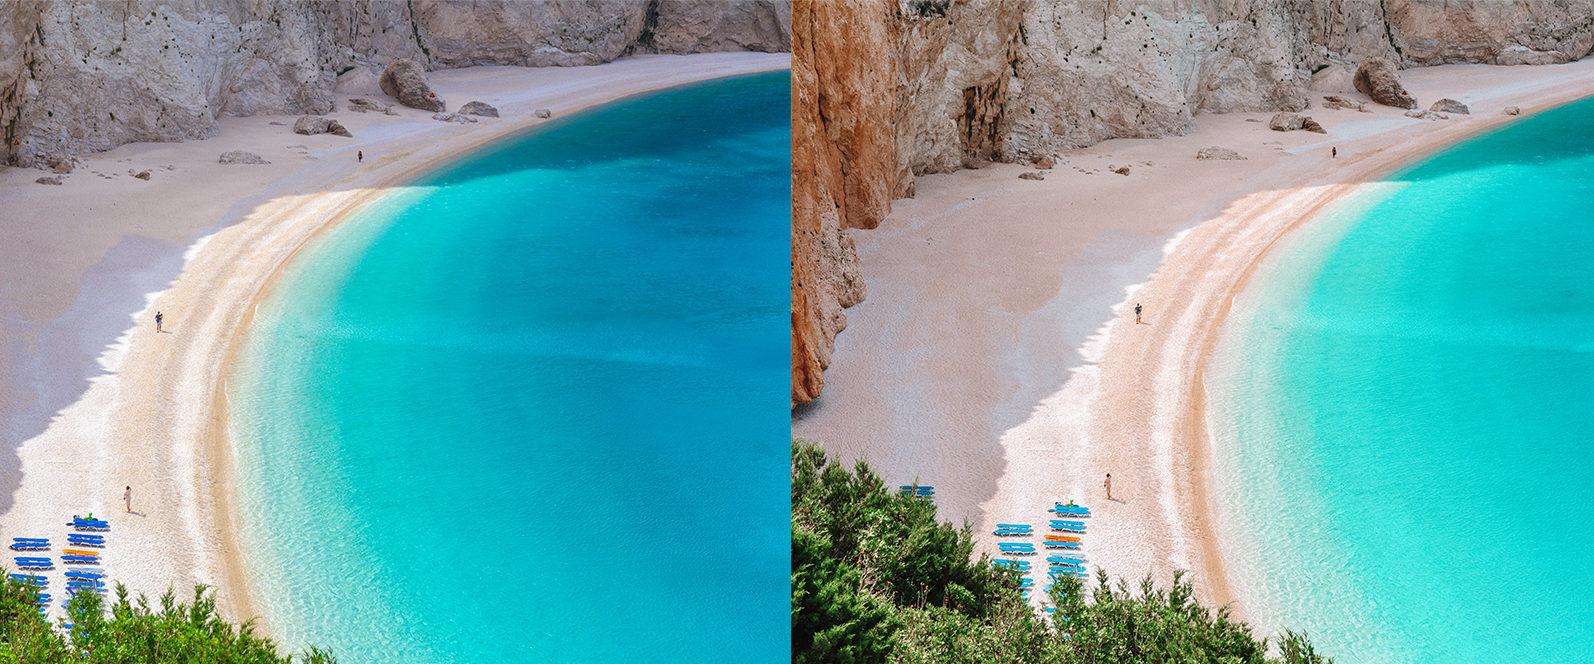 14 x Greece Lightroom Presets   Mobile and Desktop - 7 Greece 1 -